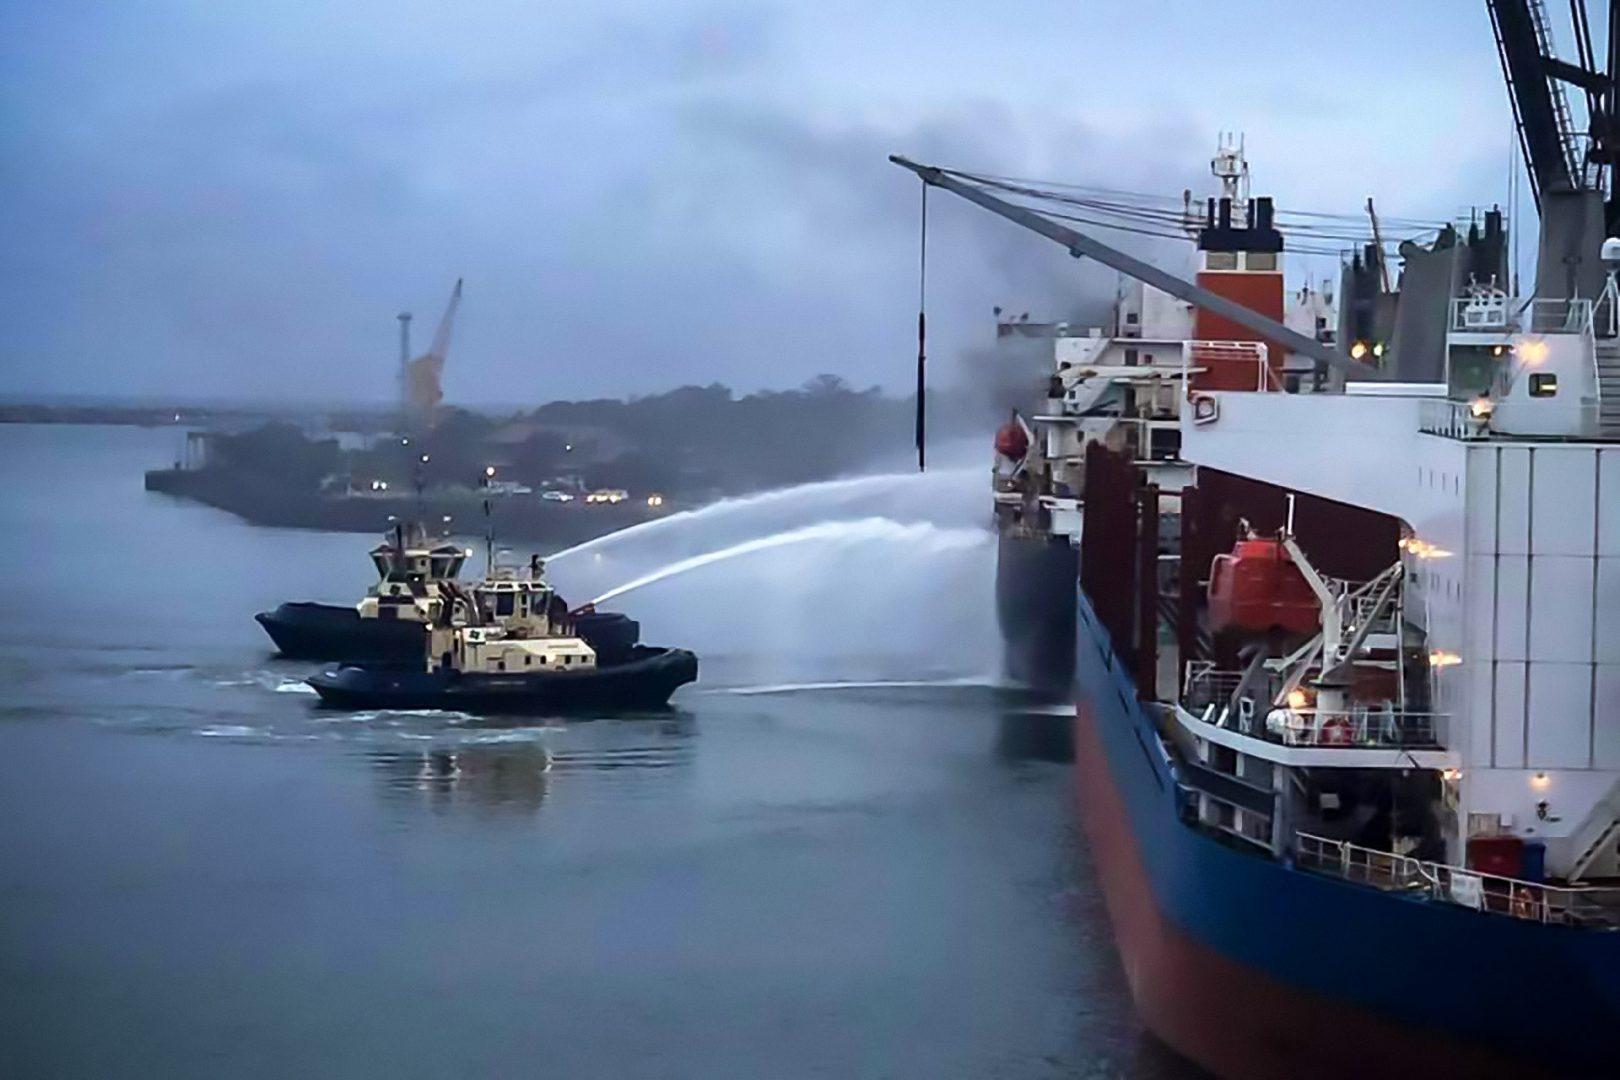 Fire Chieftain Tugs Port Kembla